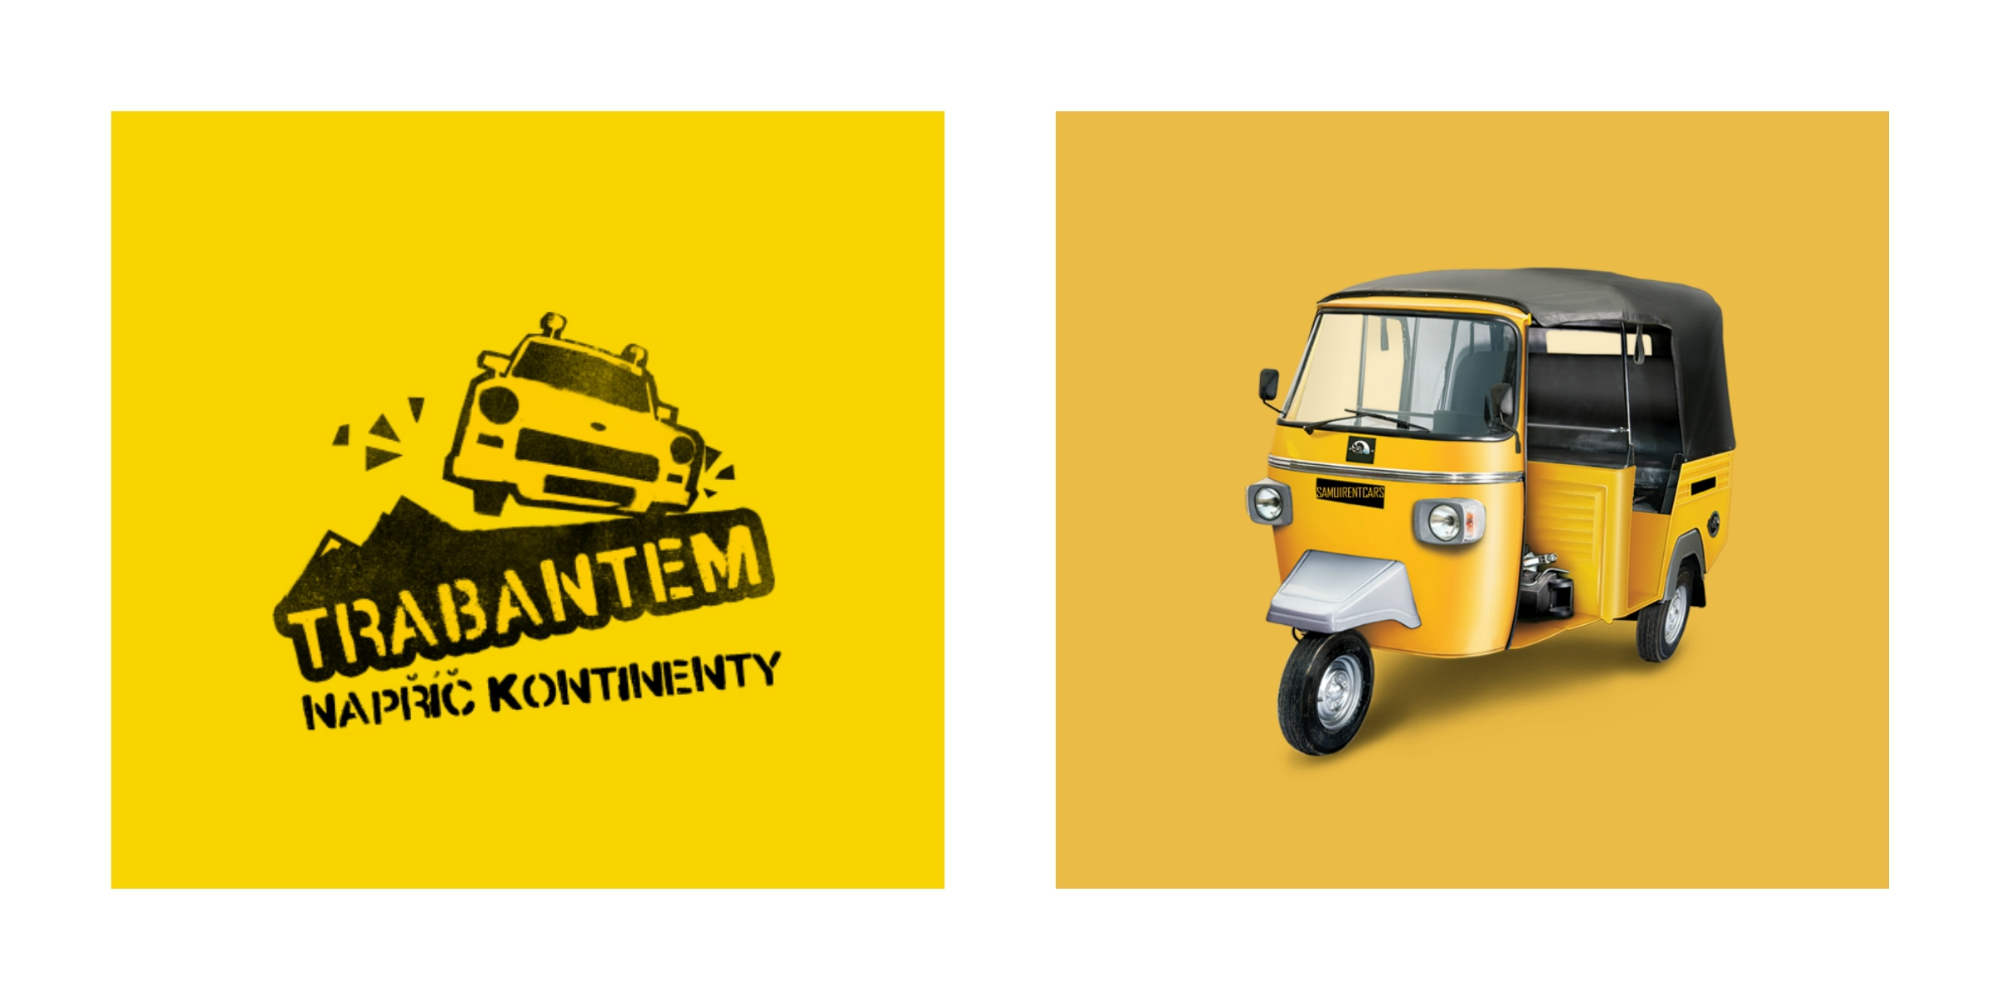 Žlá je dobrá! Ale ktorá?! Trabantia (Traffic Yellow #F7B500) alebo rikshistická (Maximum Yellow Red #ECB946)?